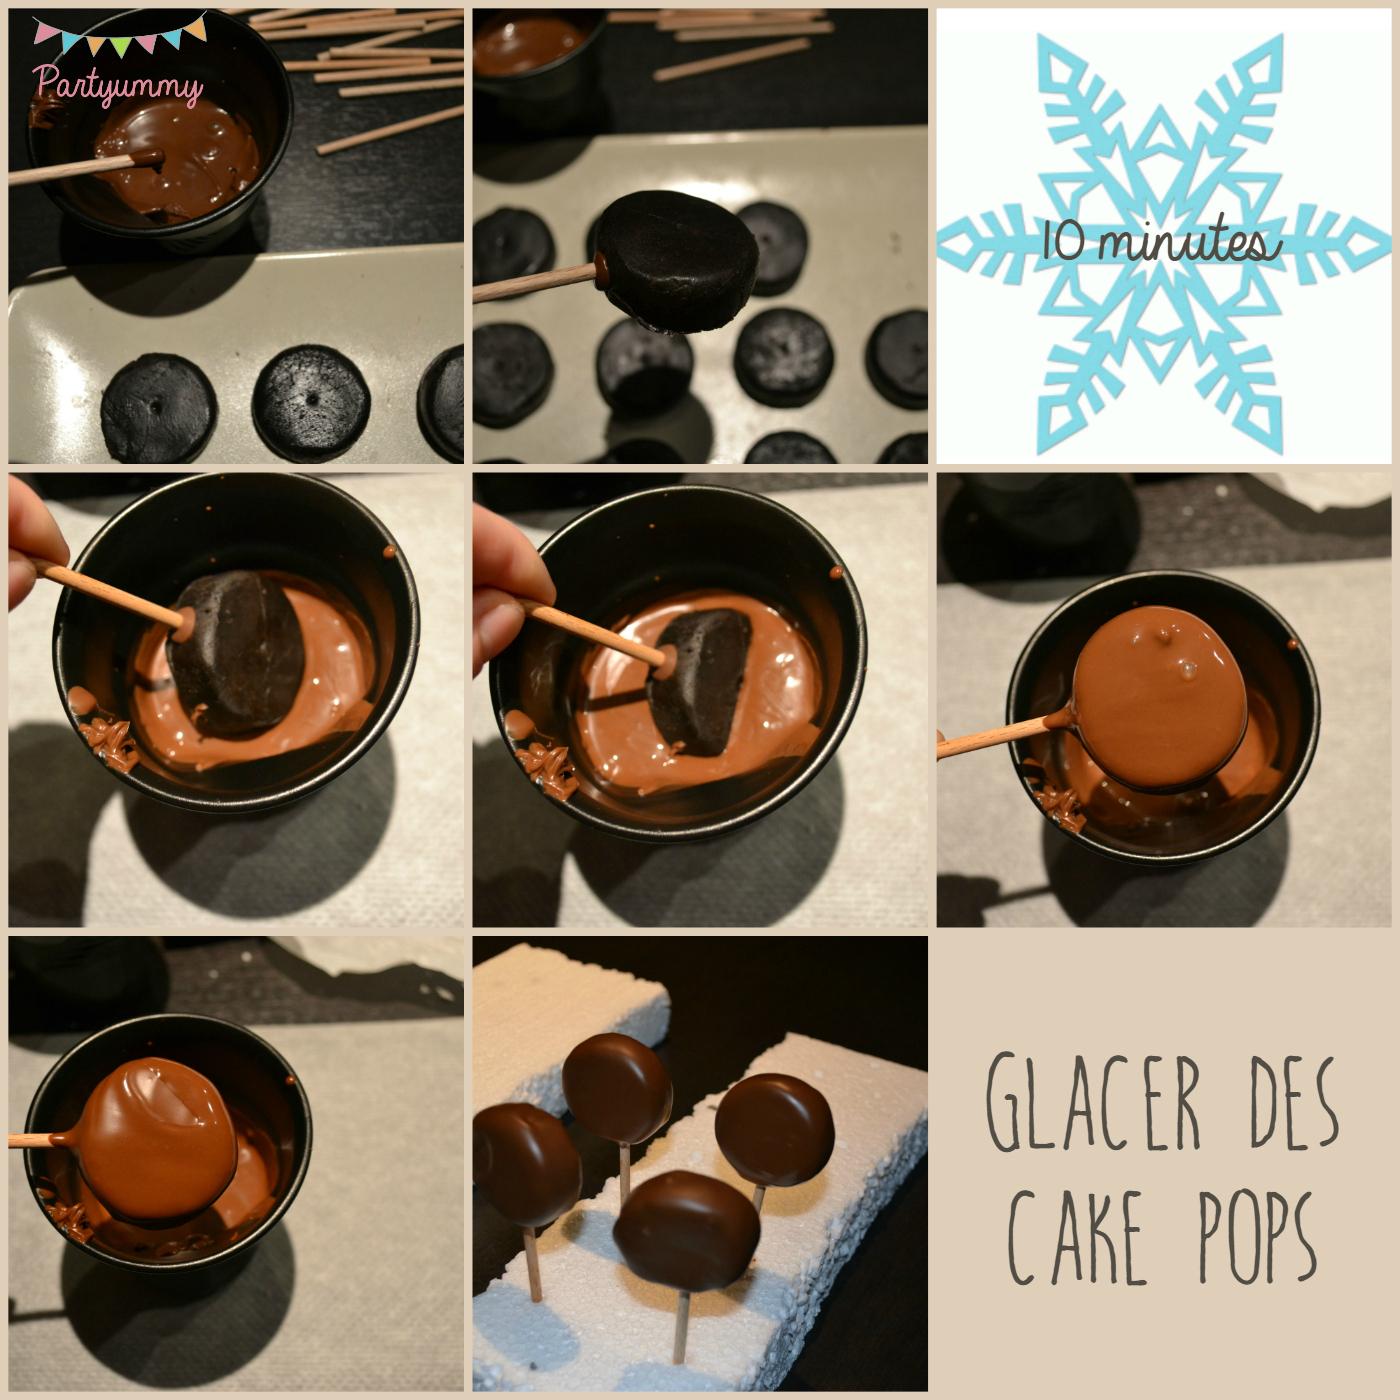 glacer-cake-pops